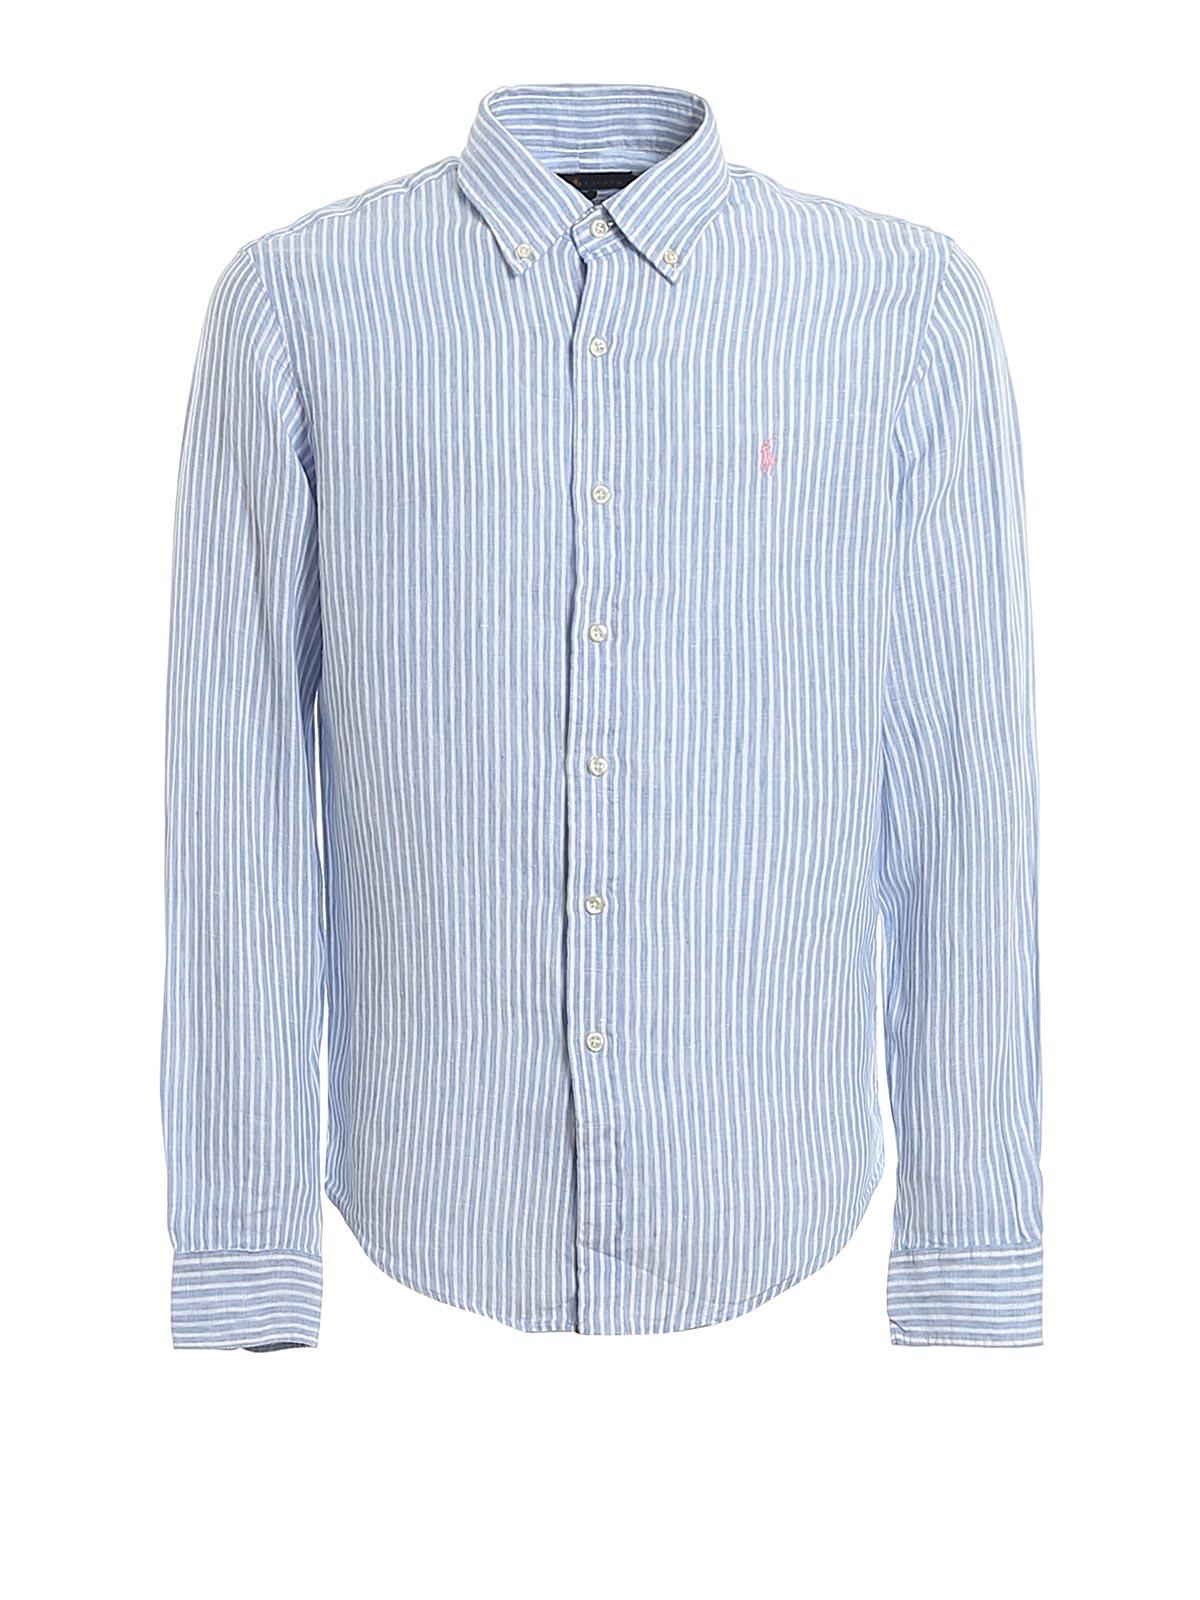 Picture of POLO RALPH LAUREN   Men's Linen Striped Shirt